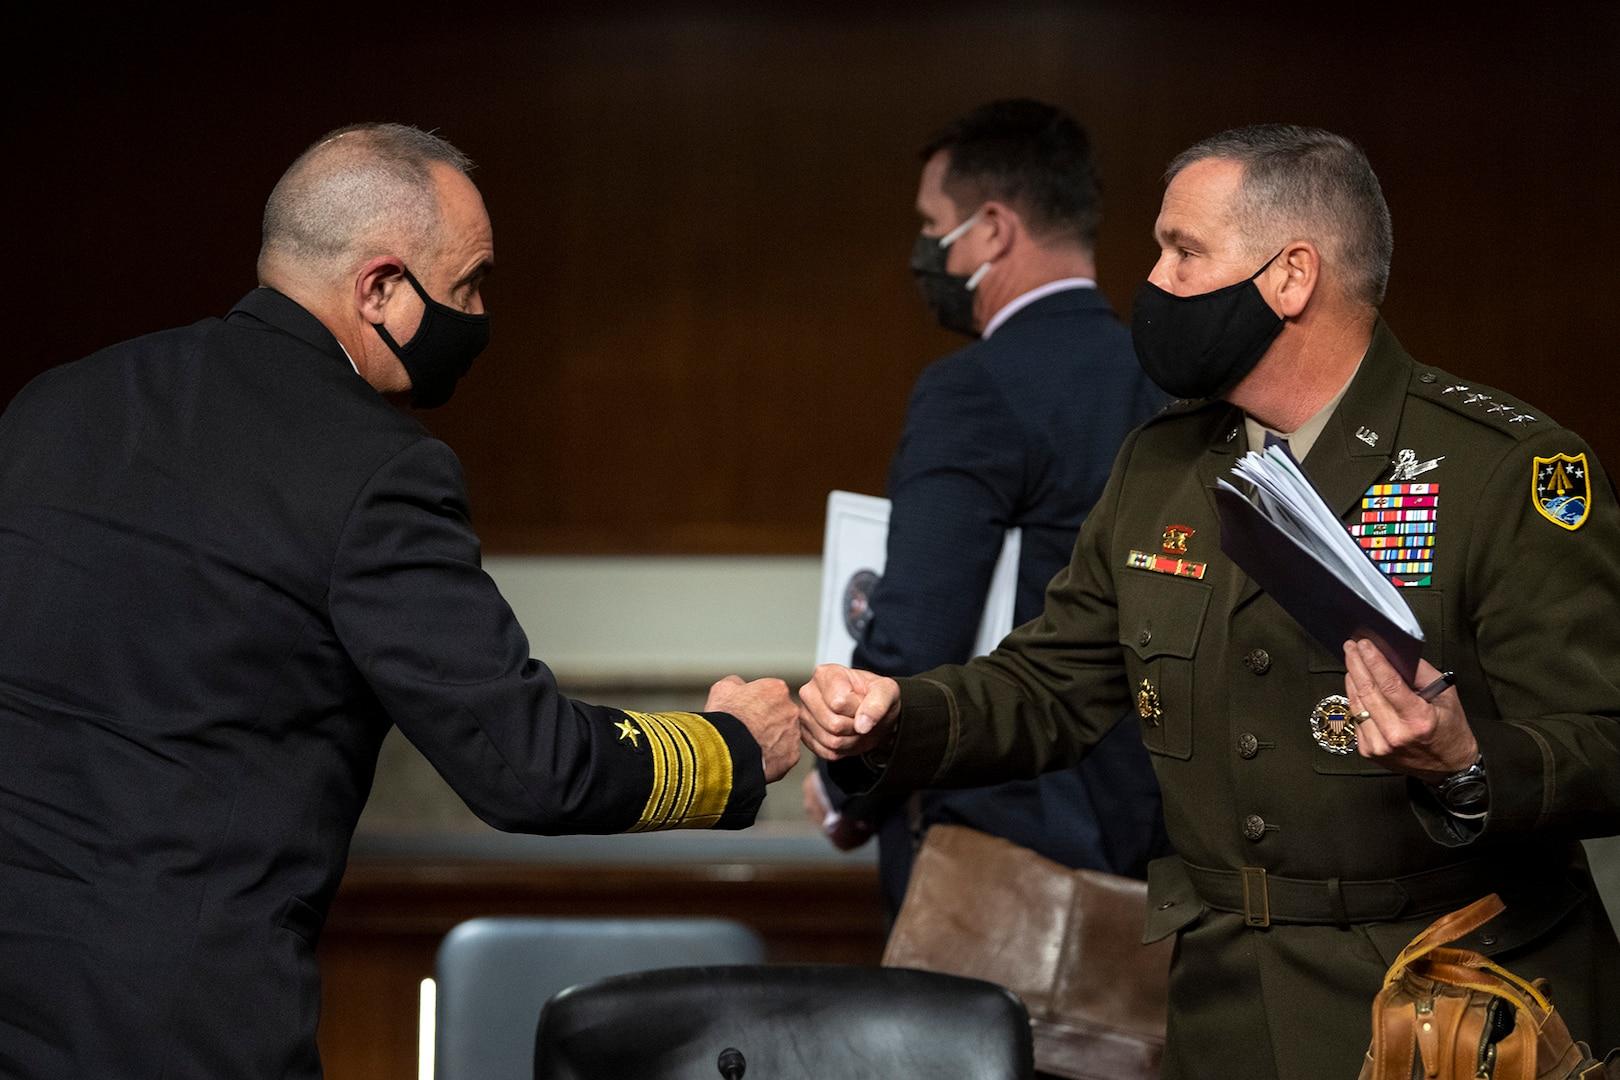 Military officers fist bump following SASC hearing.